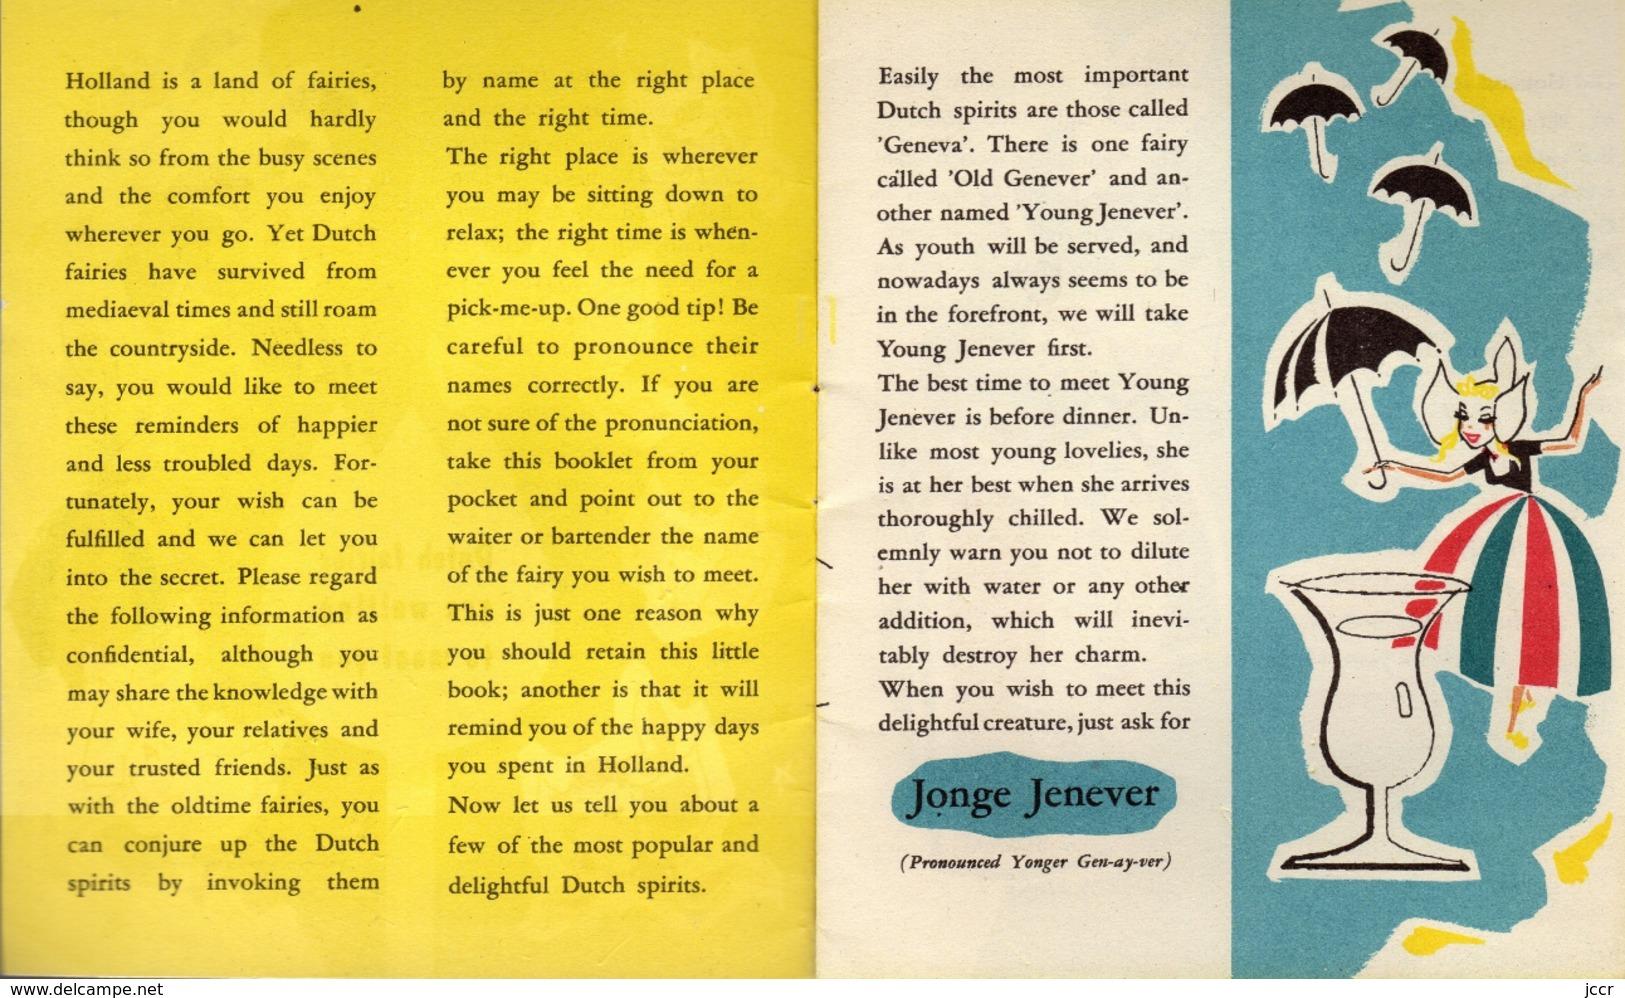 Dutch Fairies Are Waiting To Meet You - Published By Centraal Gedistilleerdbureau Schiedam (Holland) - 1957 - Cuisine, Plats Et Vins